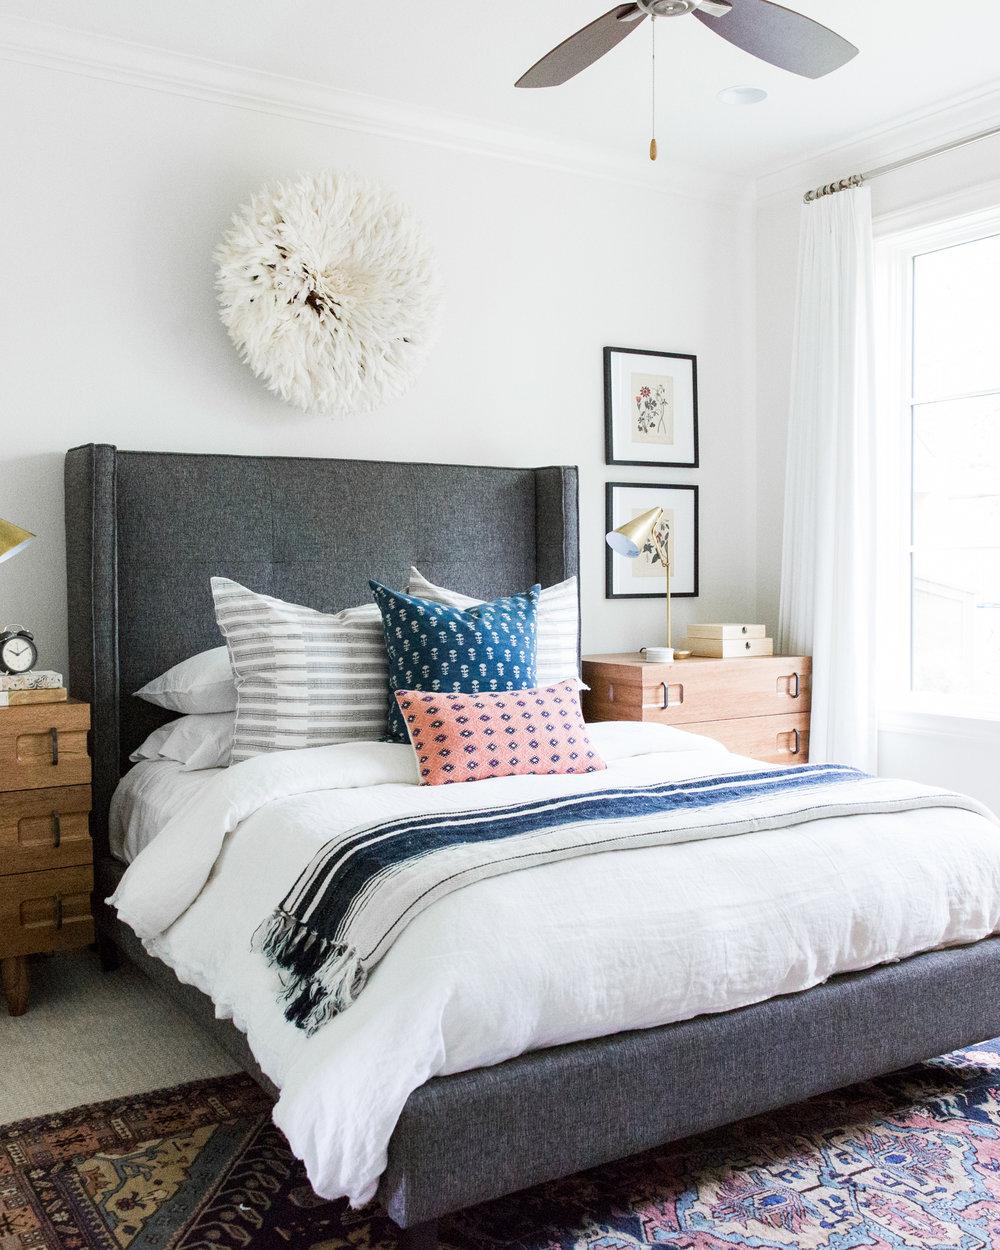 27 Stylish Ways To Decorate Your Children S Bedroom: Get The Look: Coastal Cool Bedroom